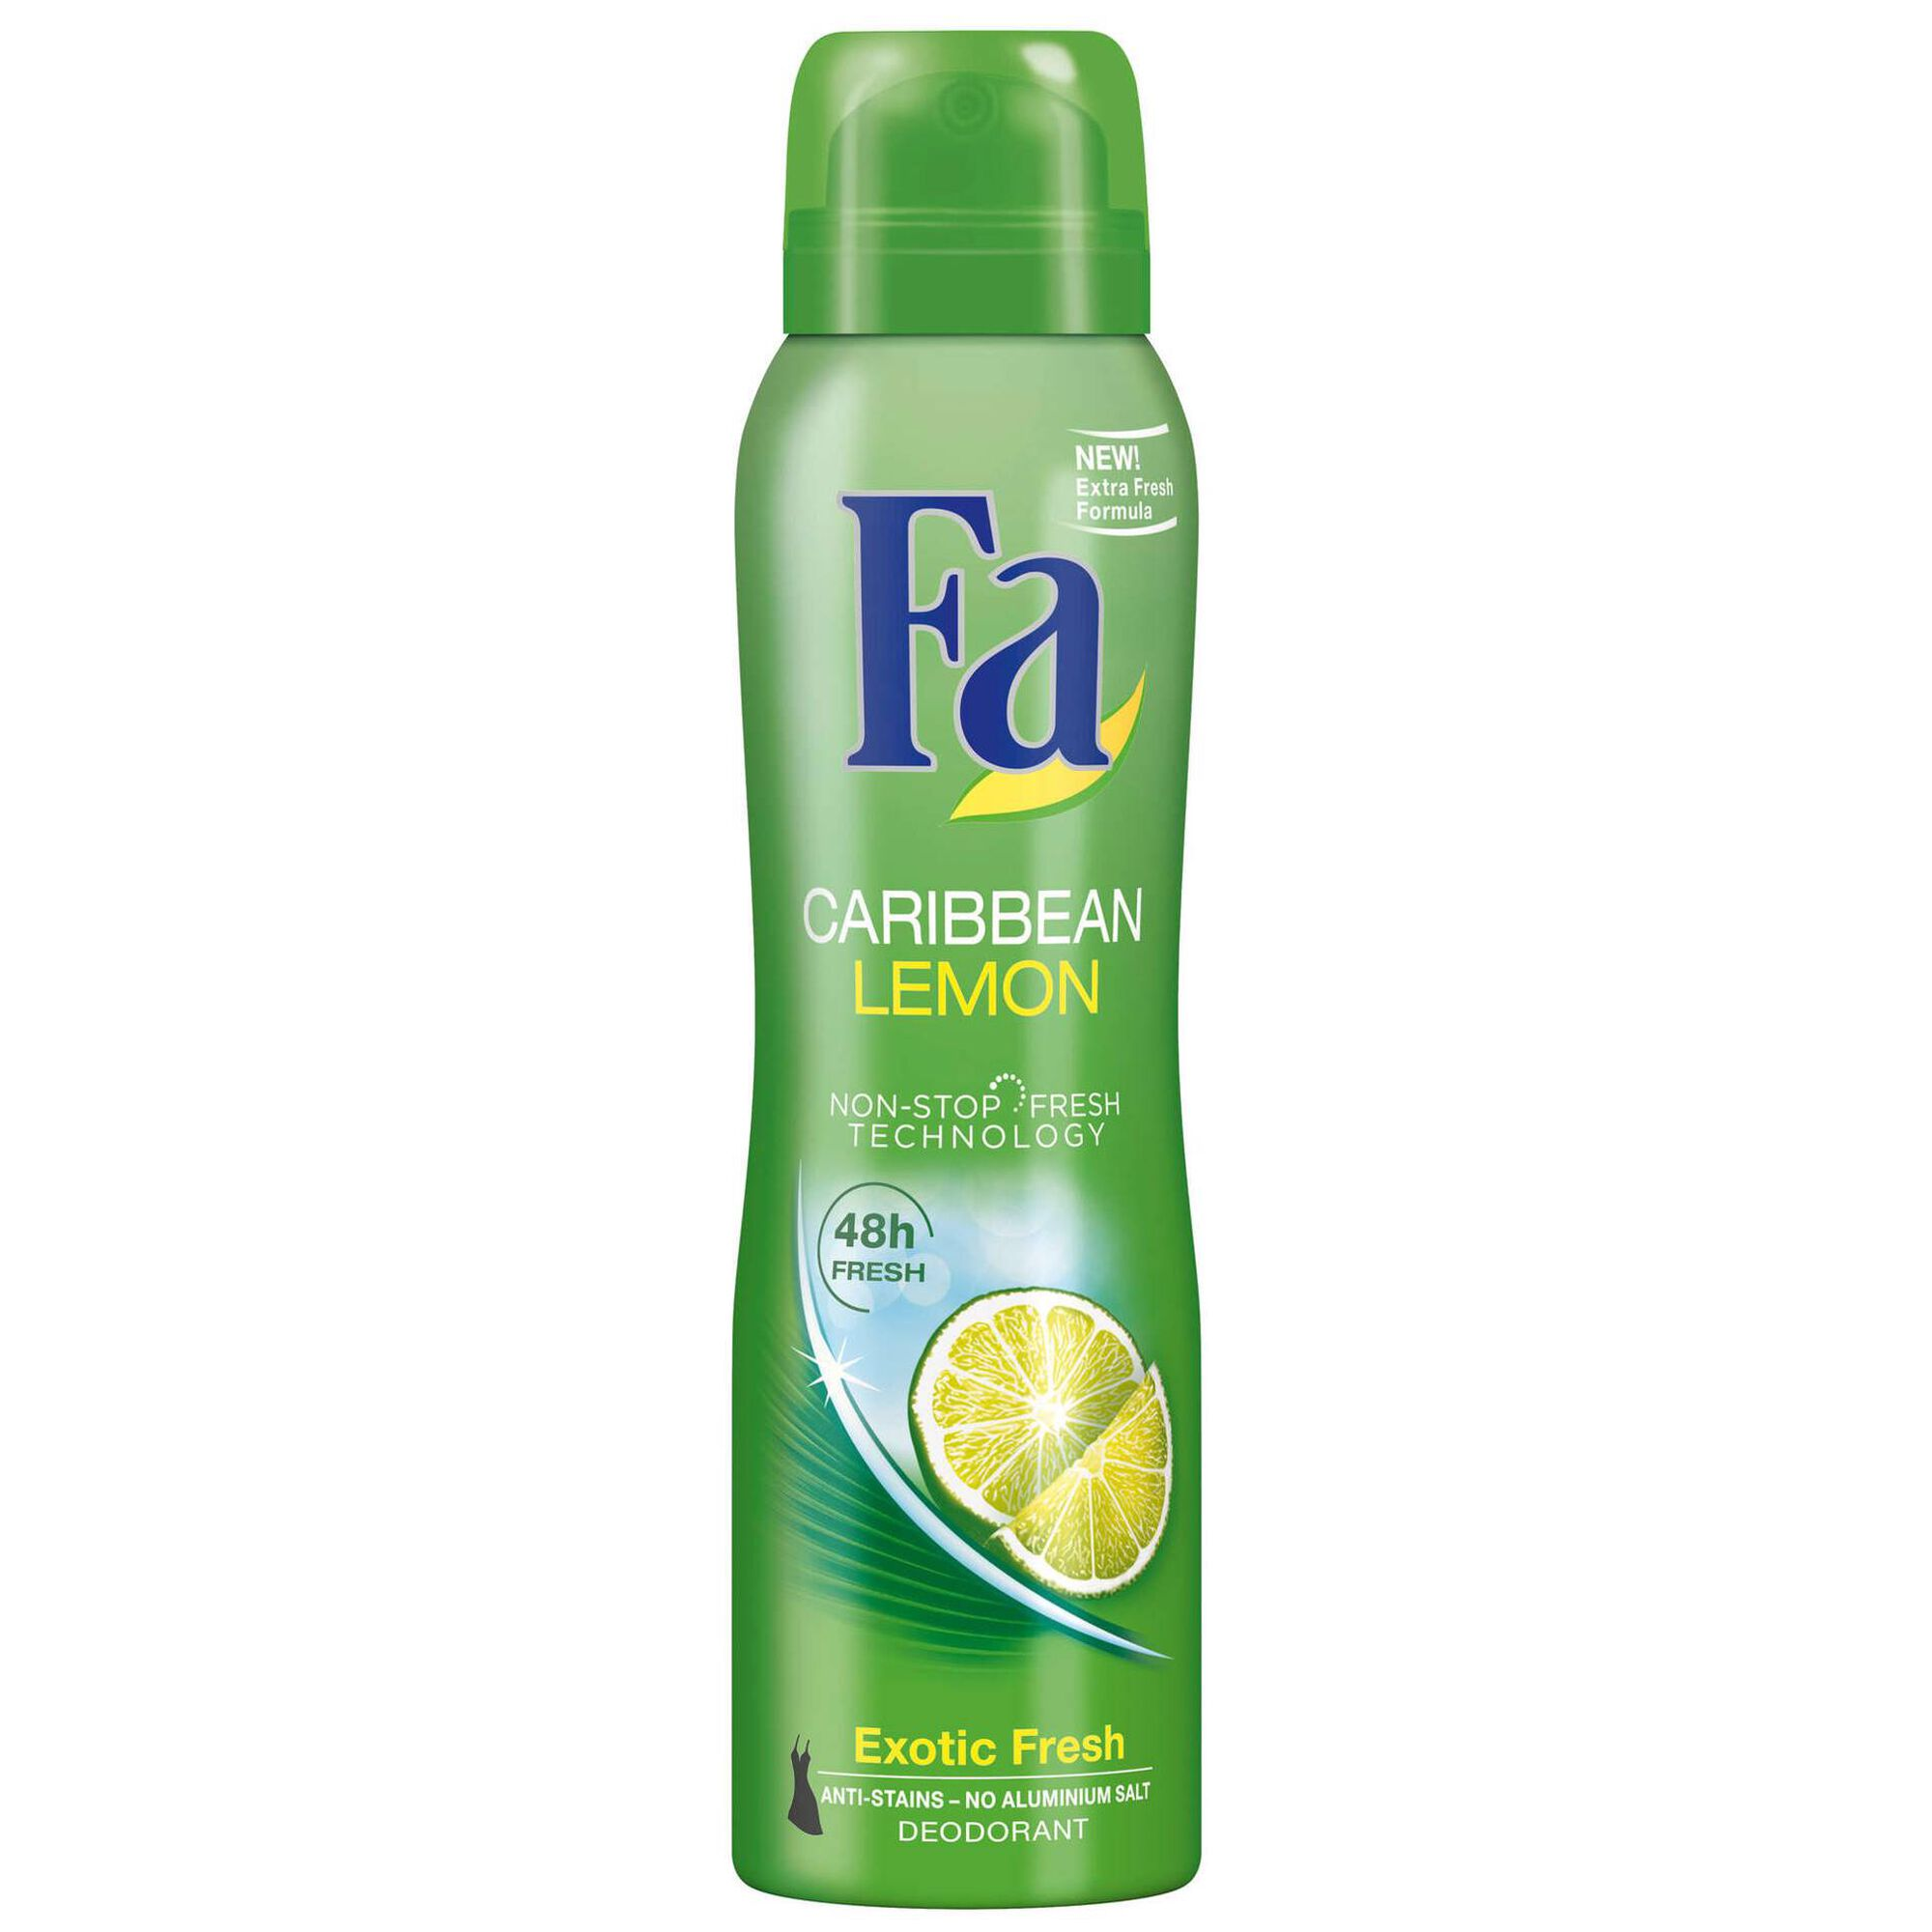 Desodorizante Spray Caribbean Lemon